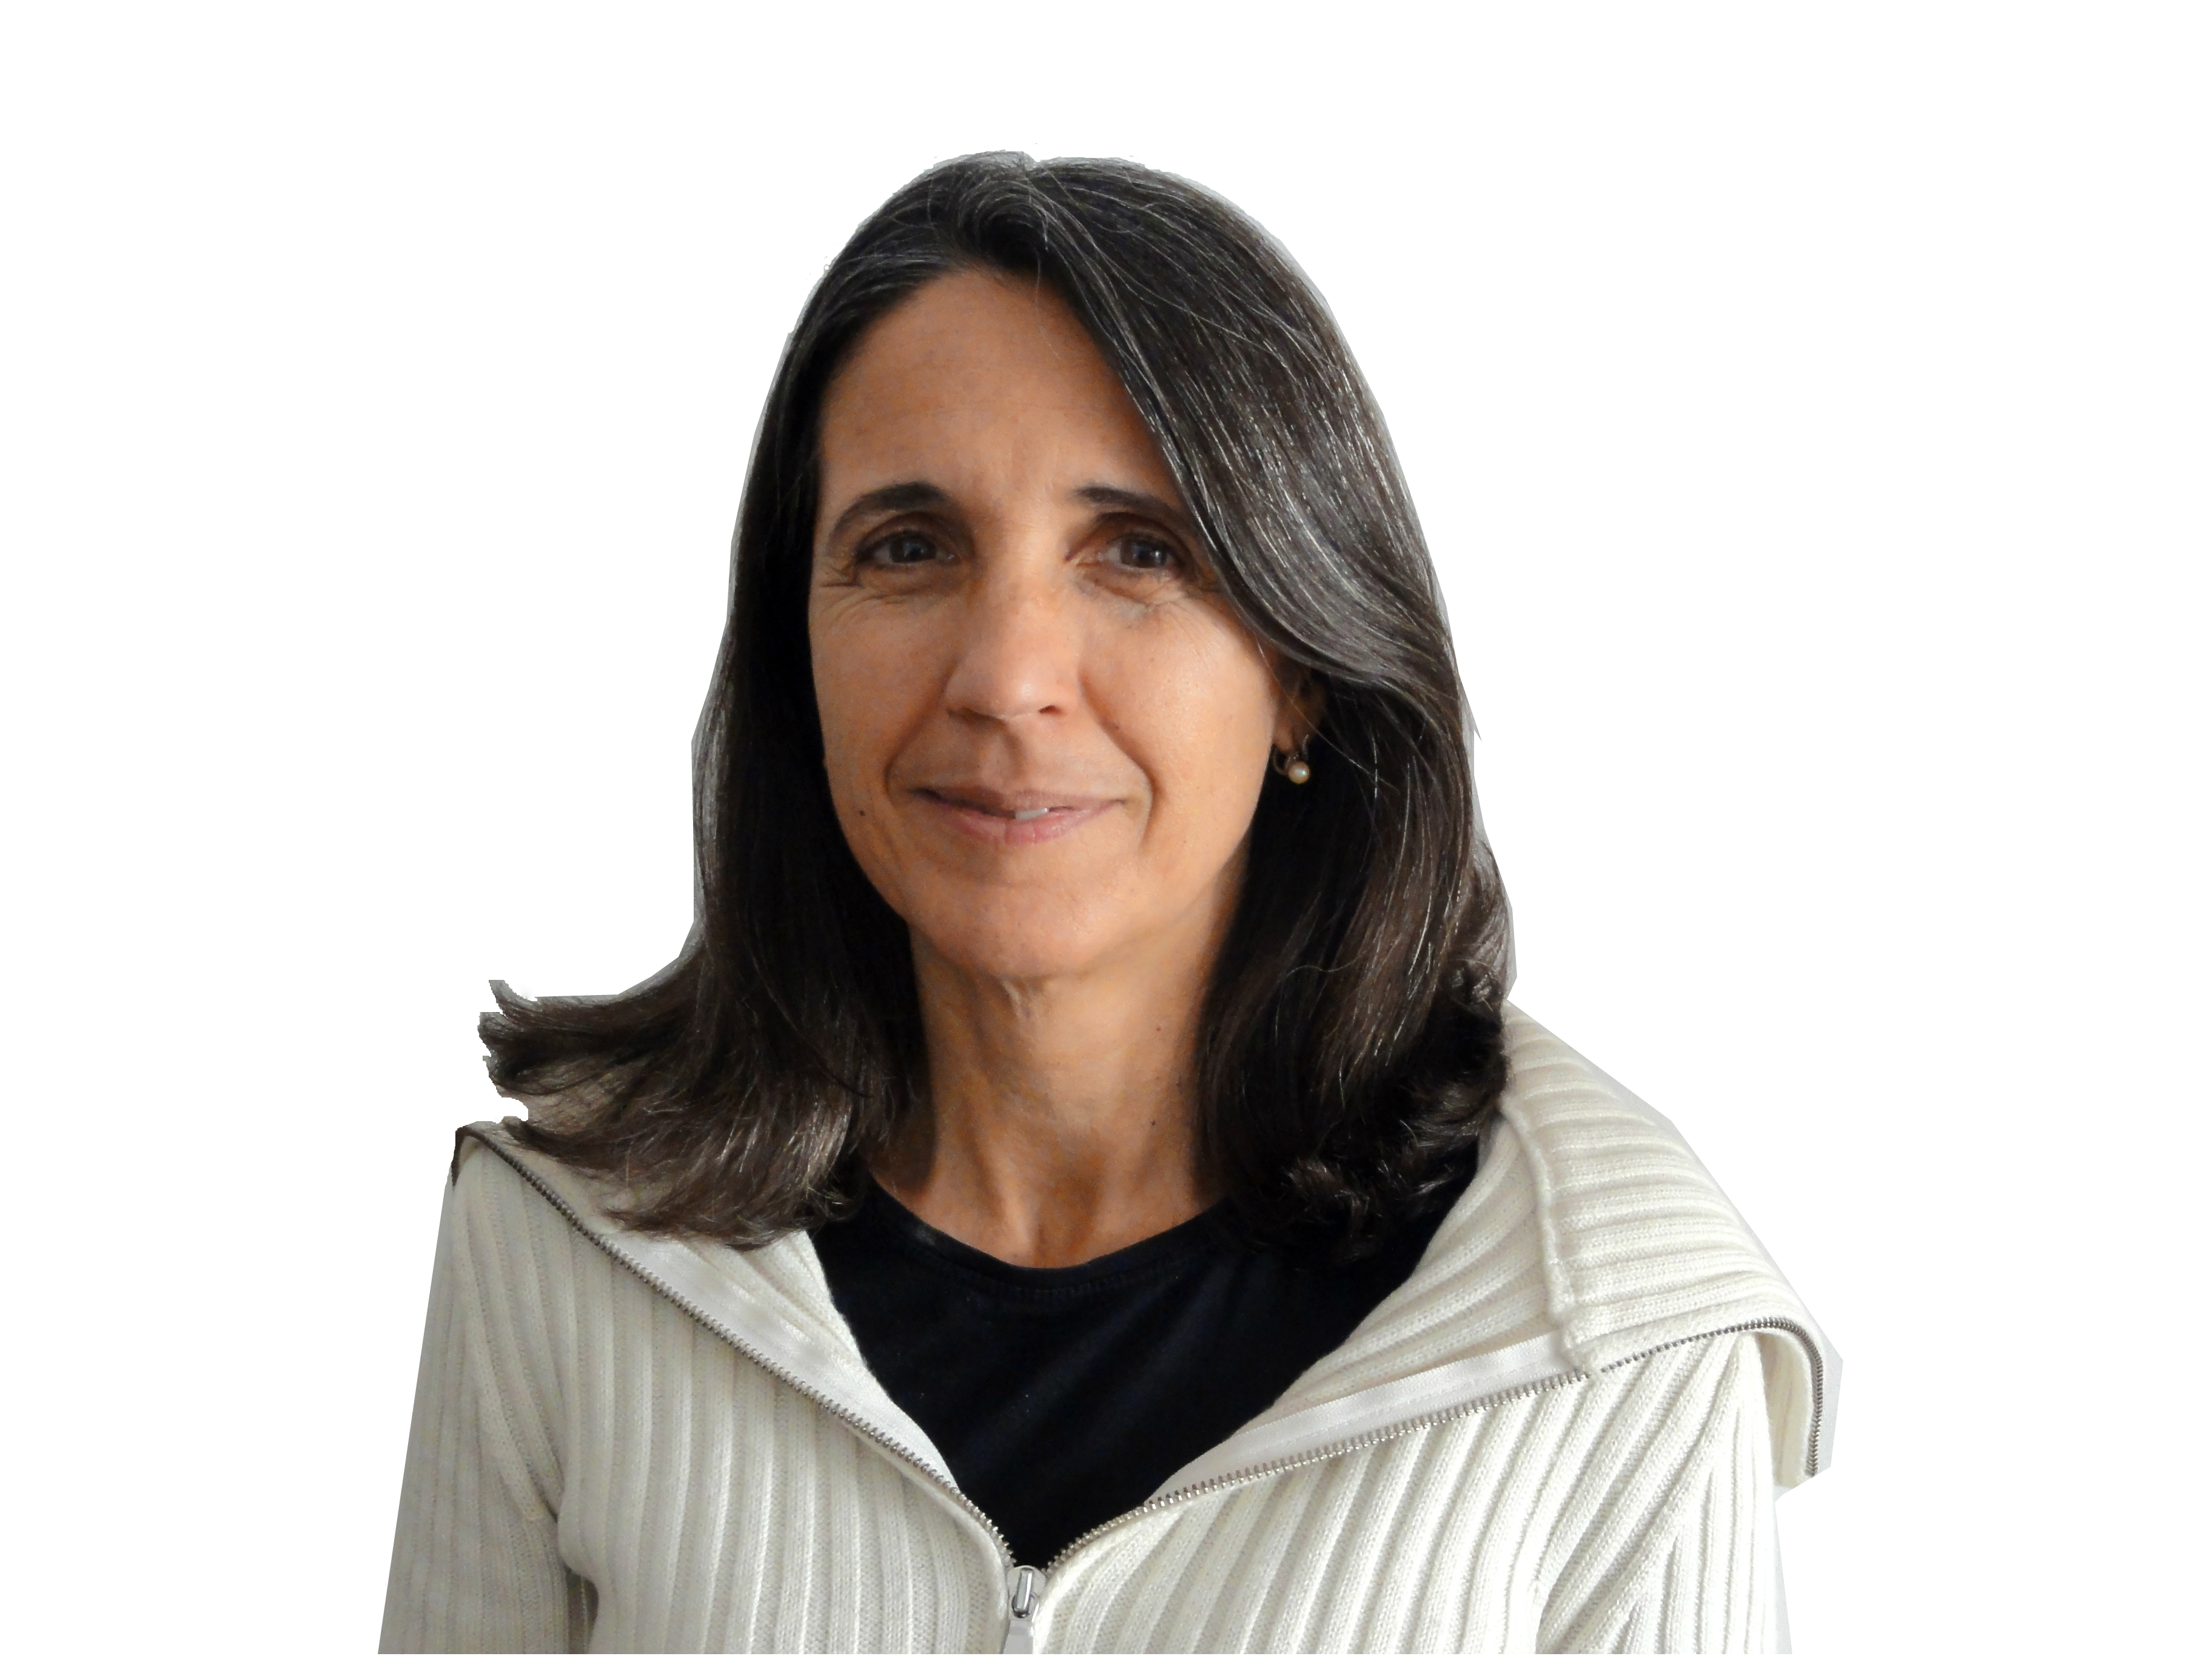 Dra. Marta Coll Piera